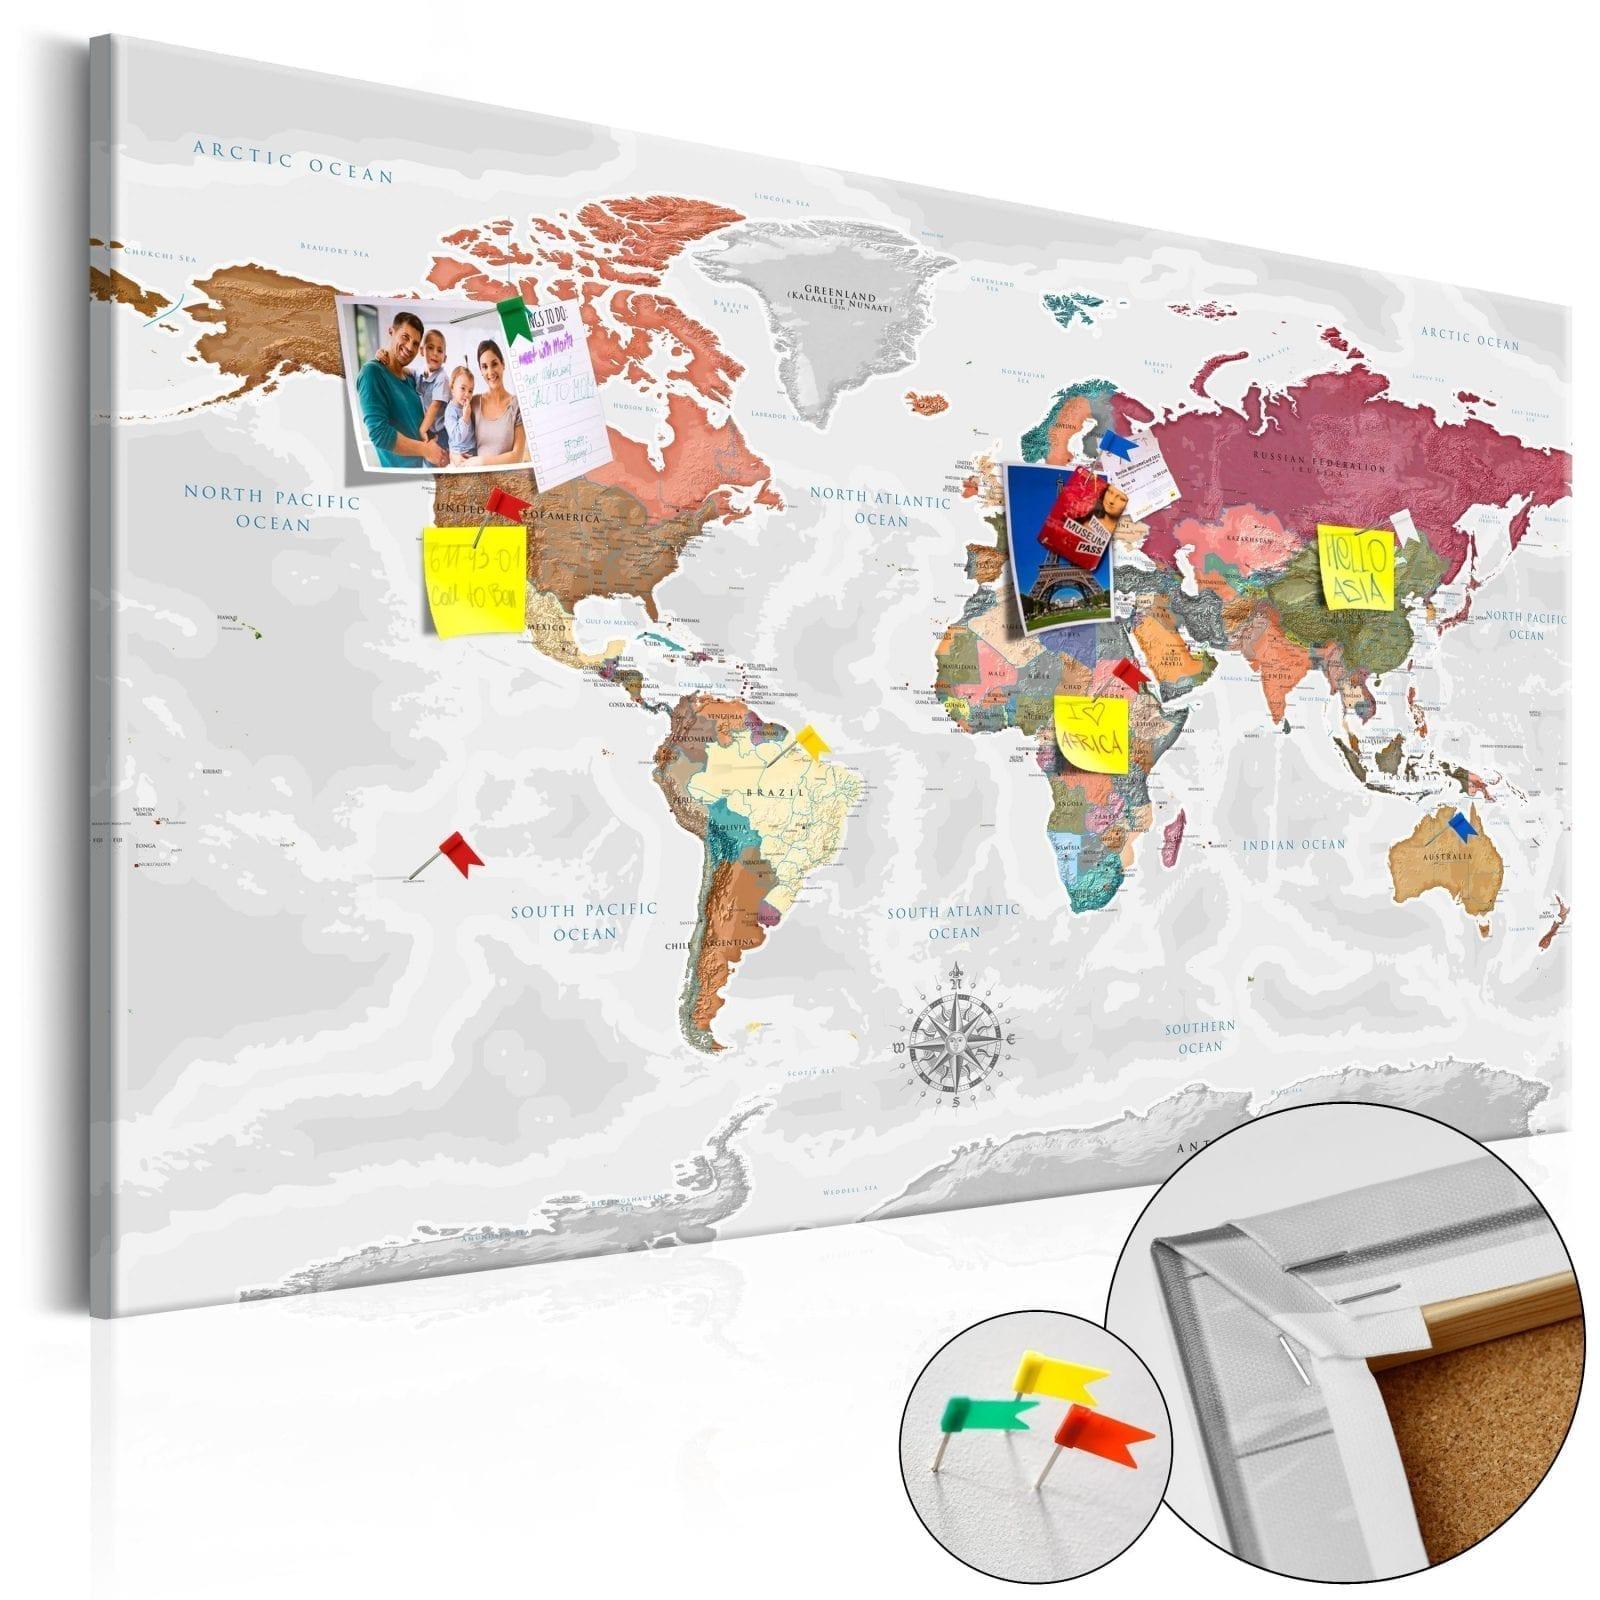 Tablero de corcho - Travel Around the World 1 | Potspintura.com